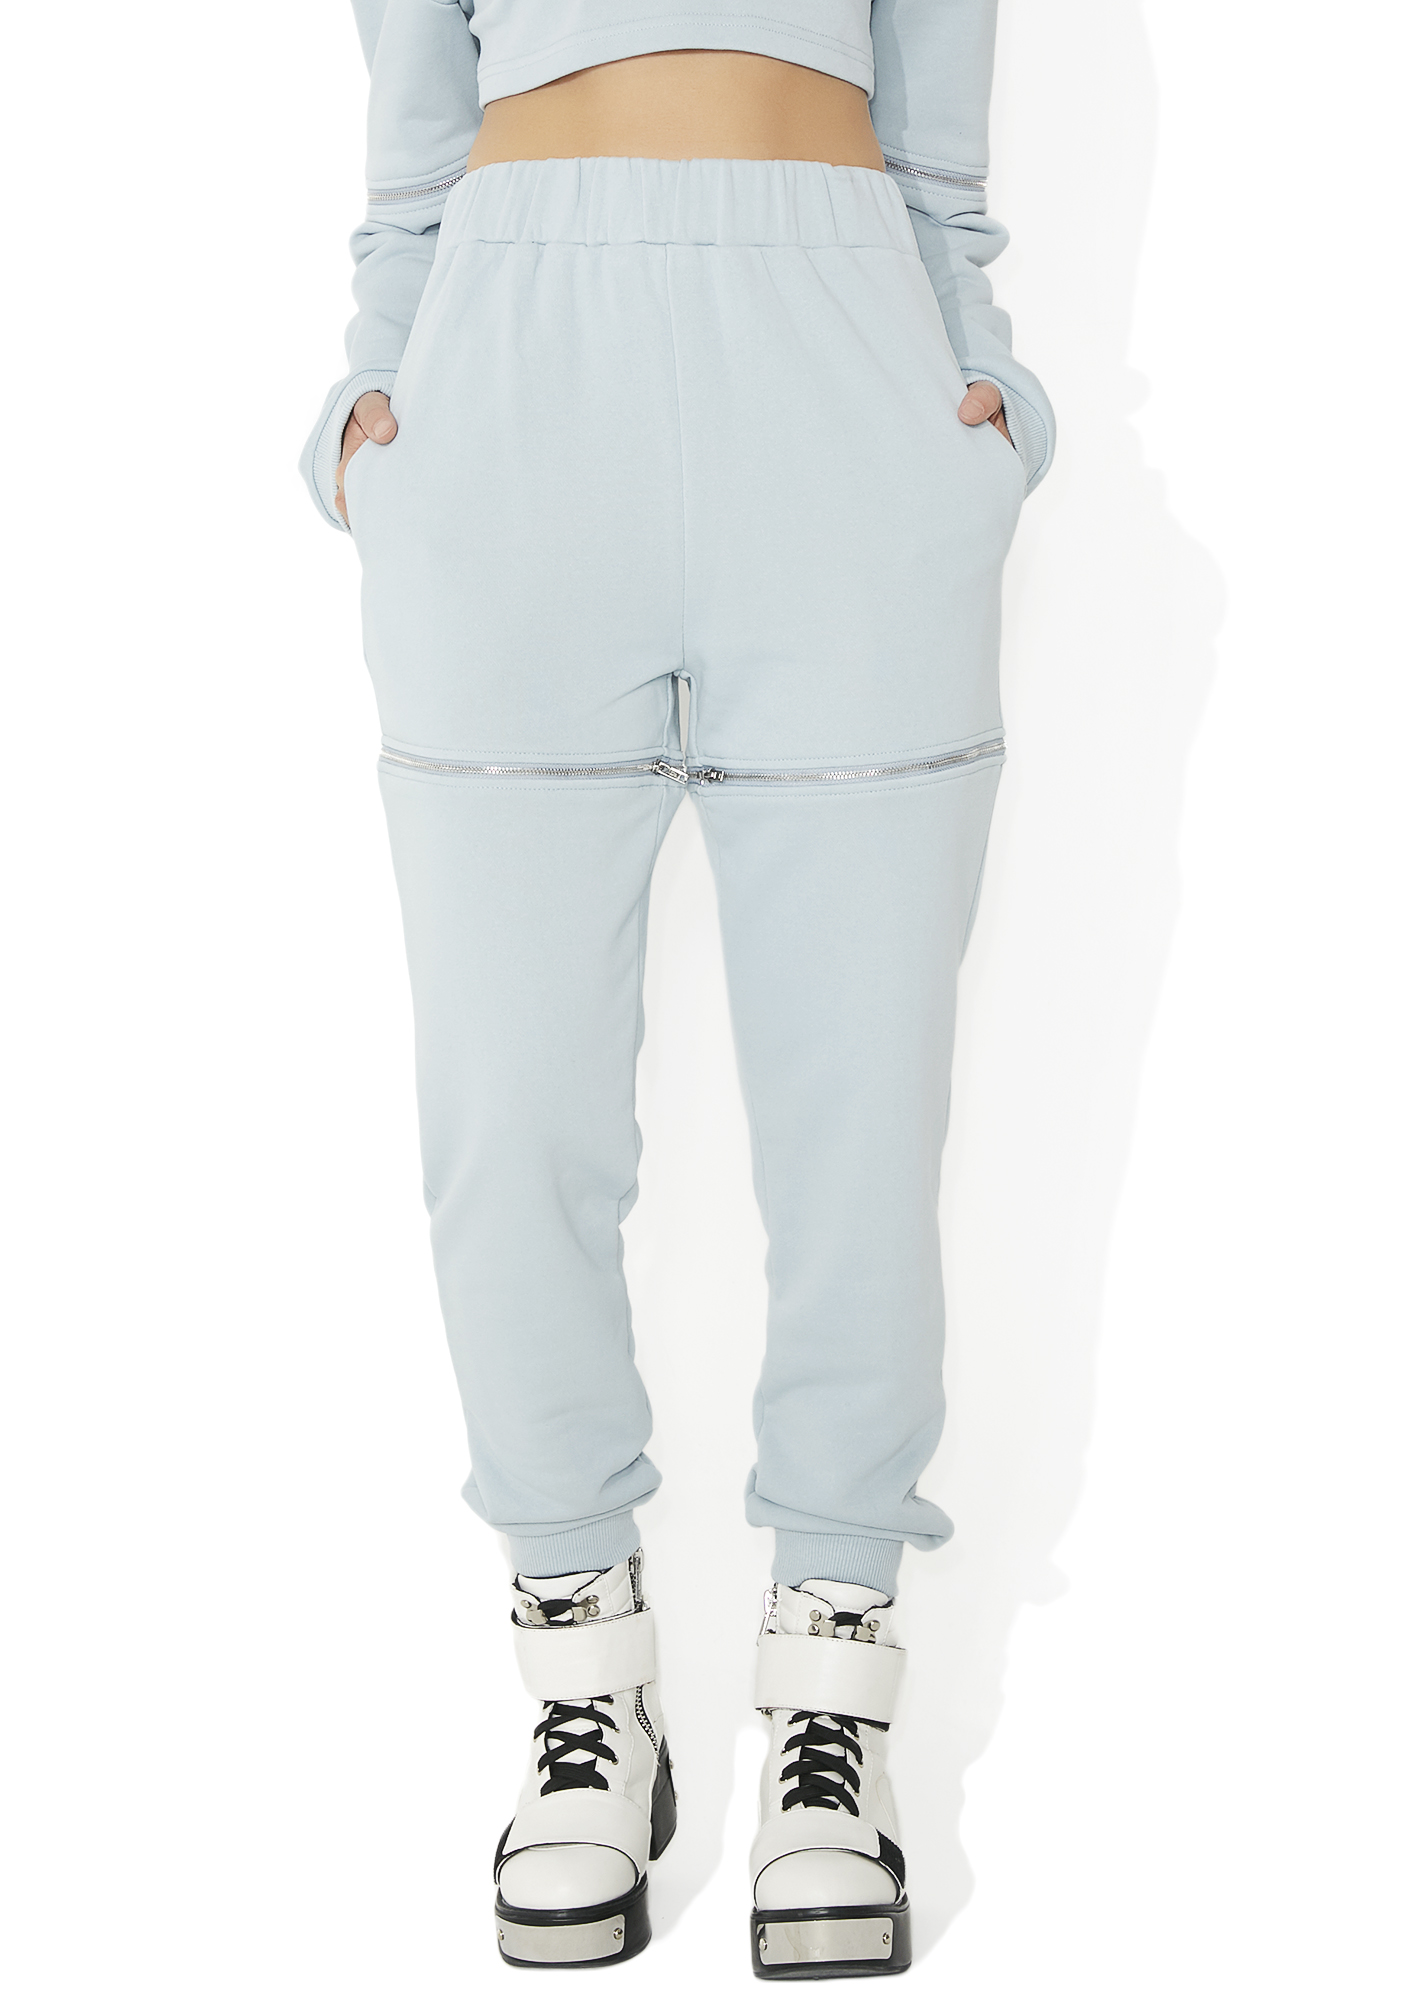 Light Blue Zip Off Sweatpants